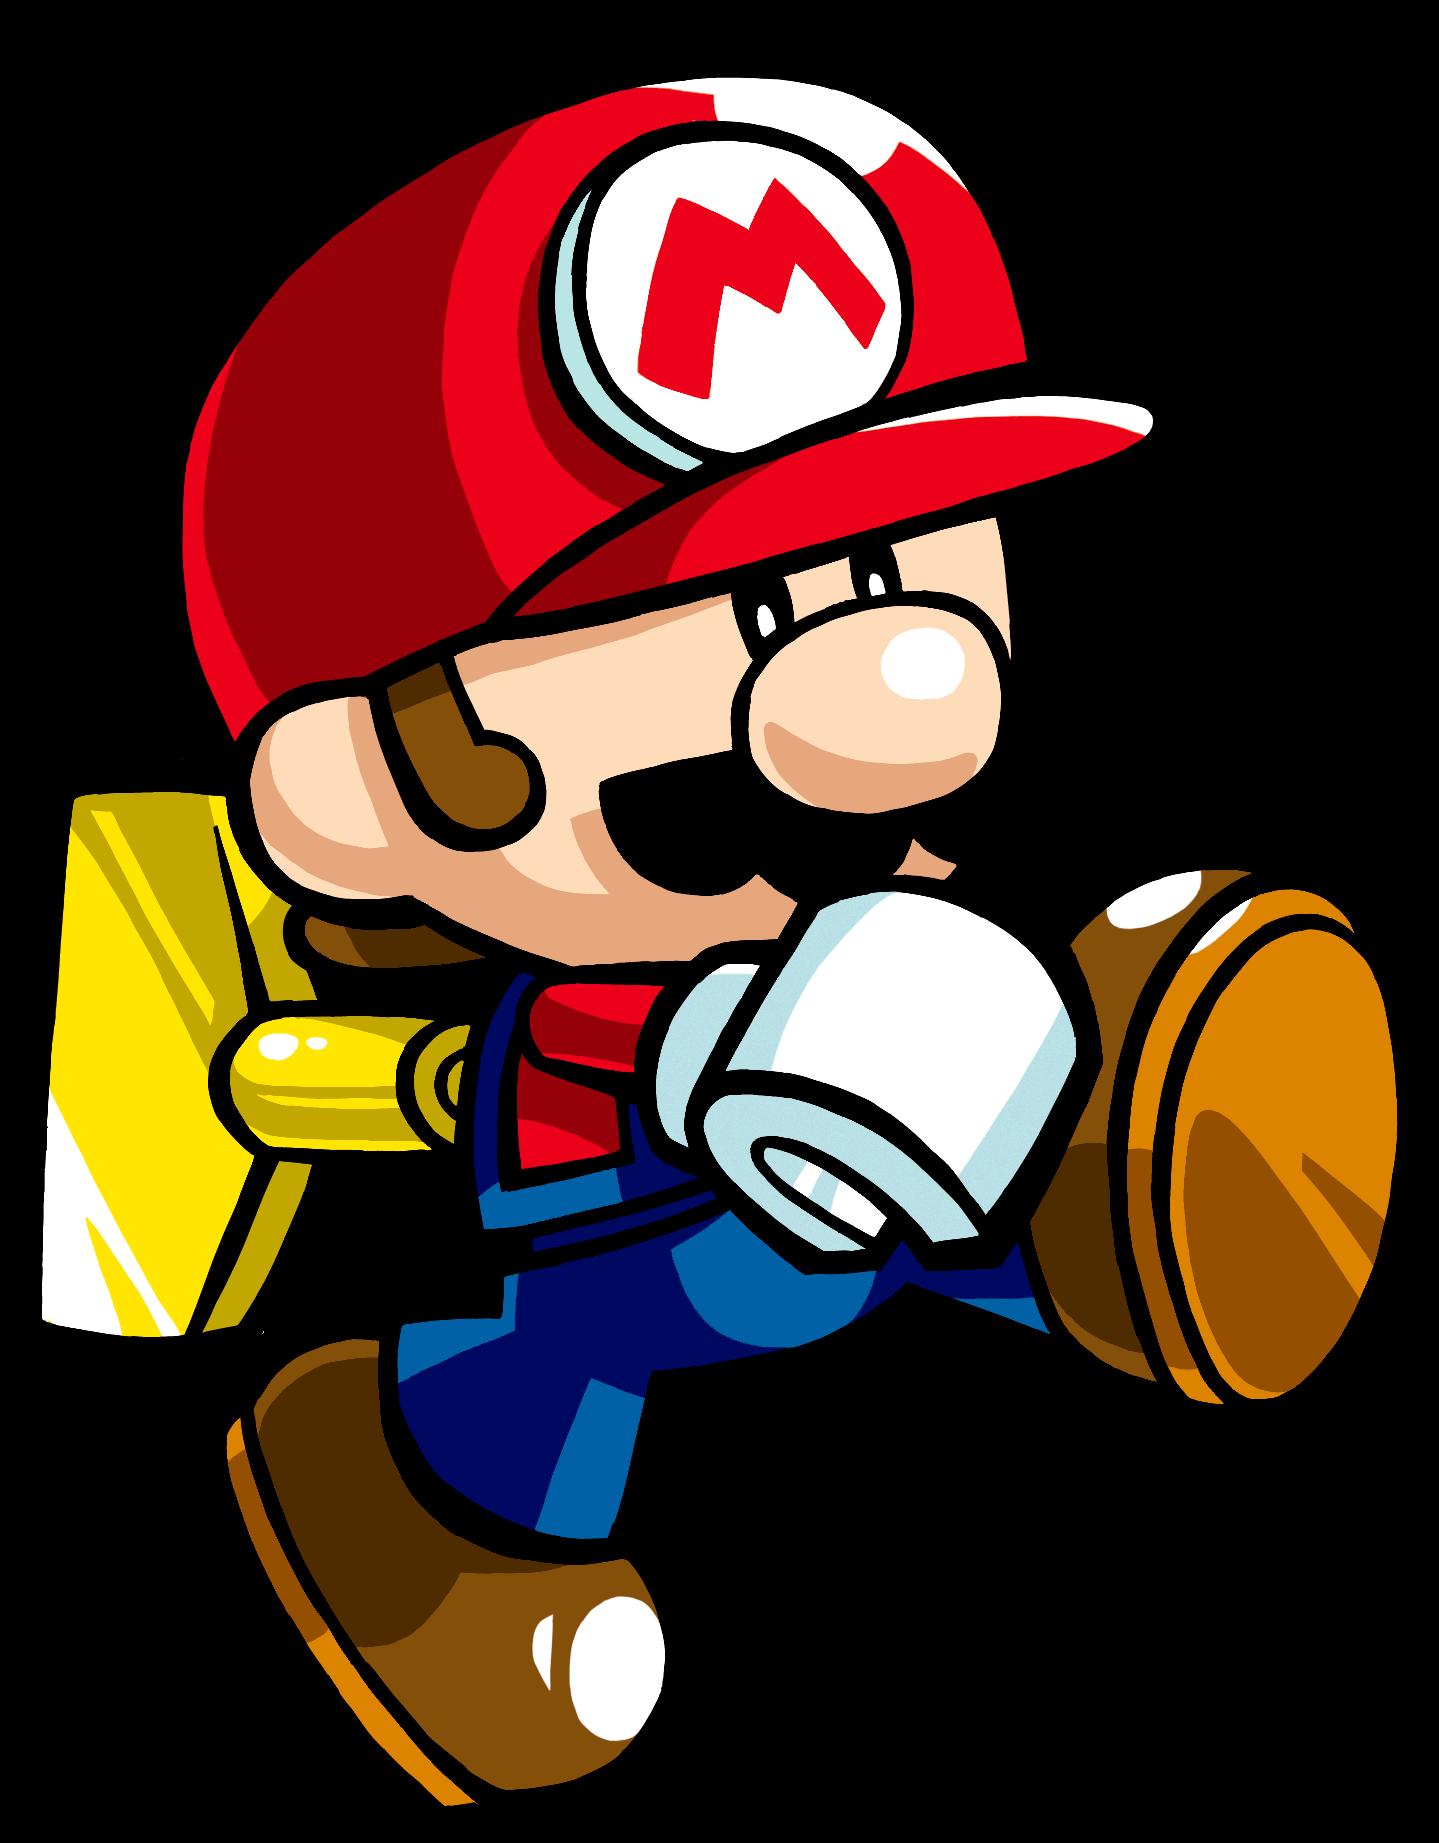 [Image: Mini_Mario.png]